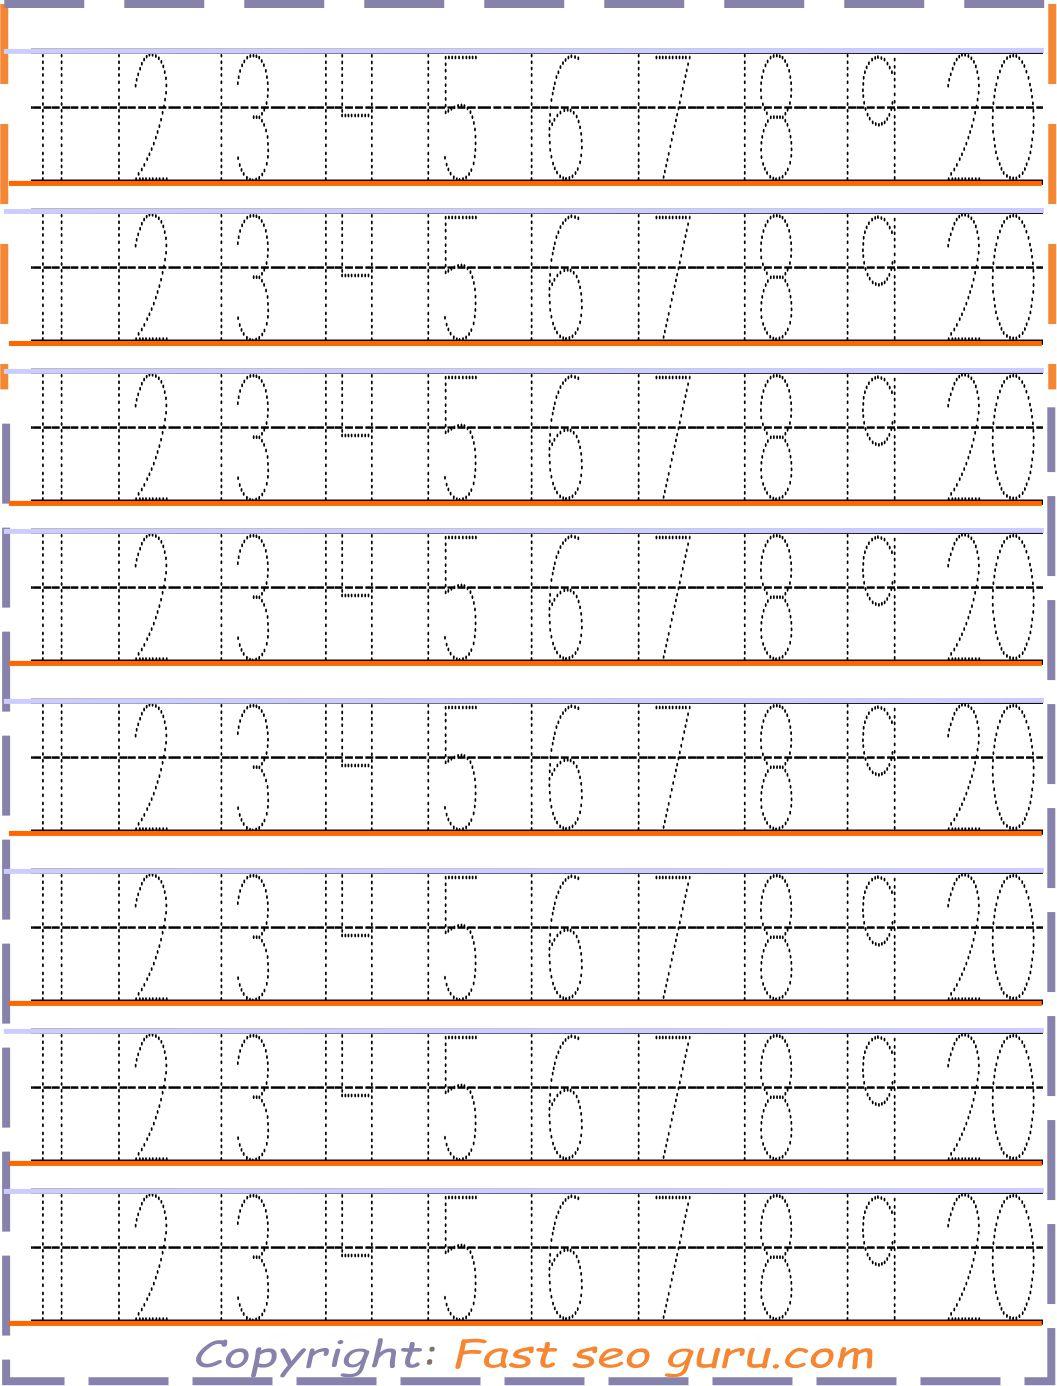 Number Tracing 12 20 Worksheets For Kids